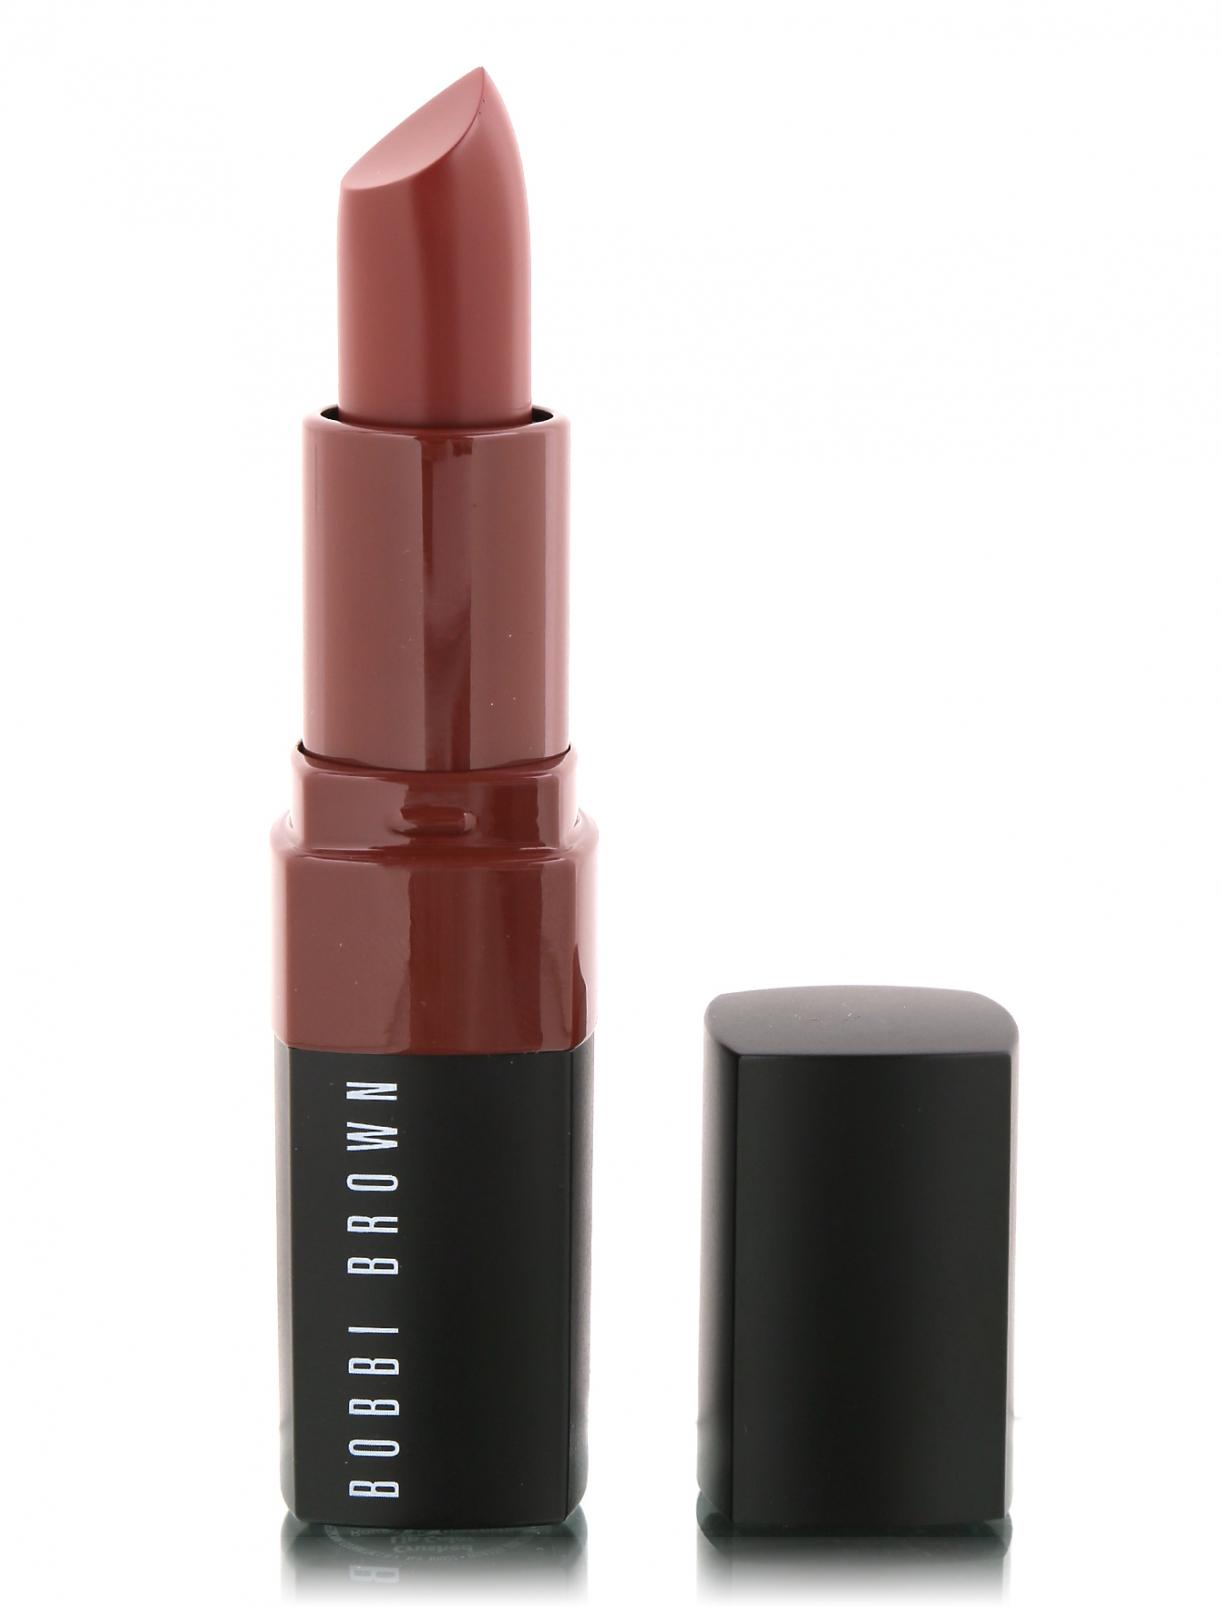 Помада Telluride Crushed Lip Color Bobbi Brown  –  Общий вид